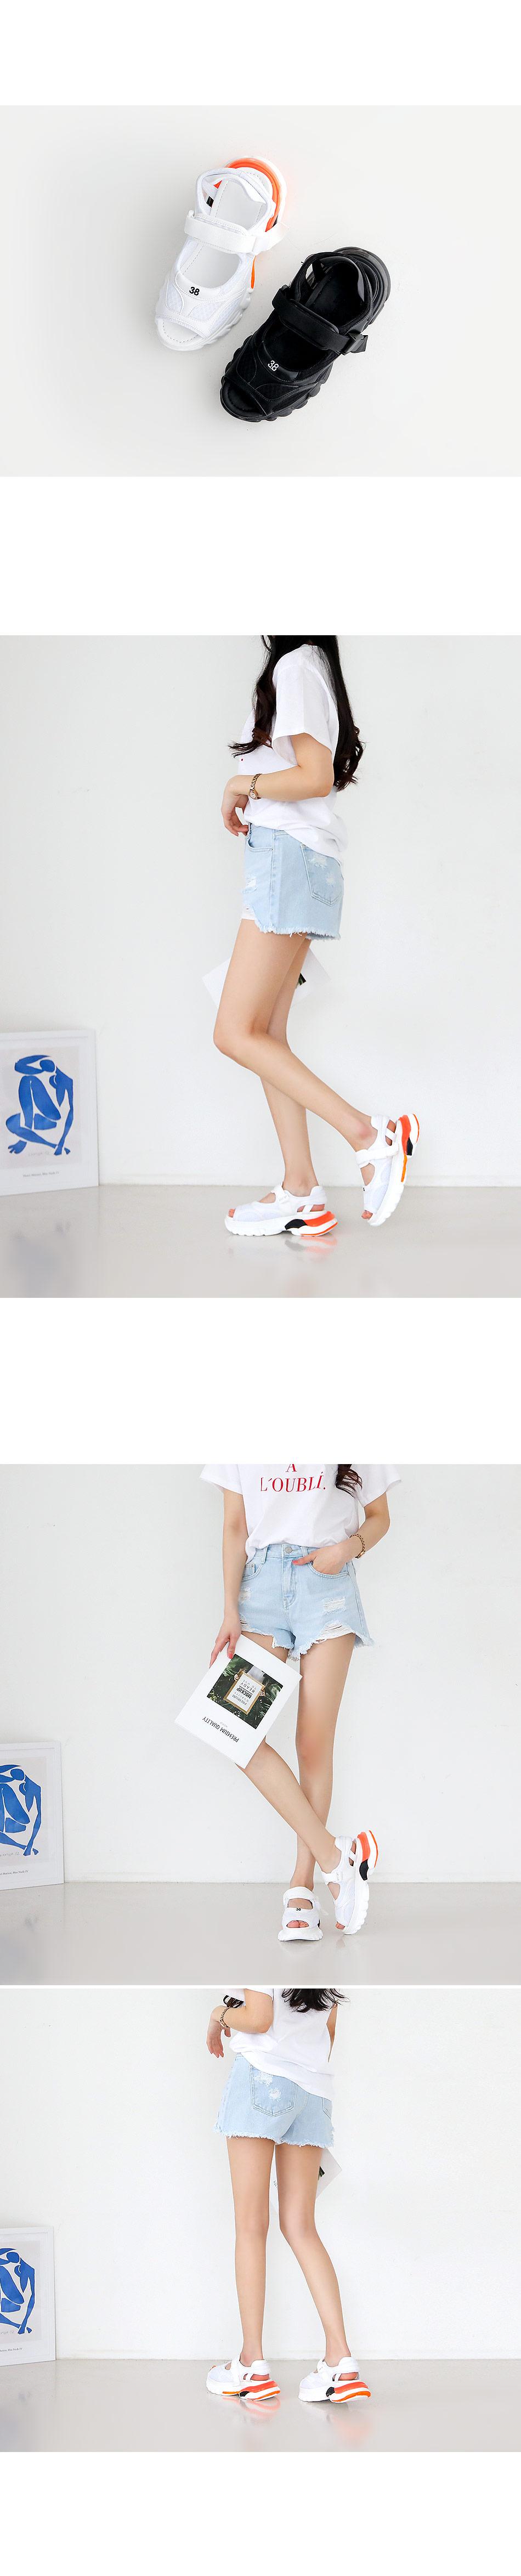 Geloroa Ugly Sandals 5cm